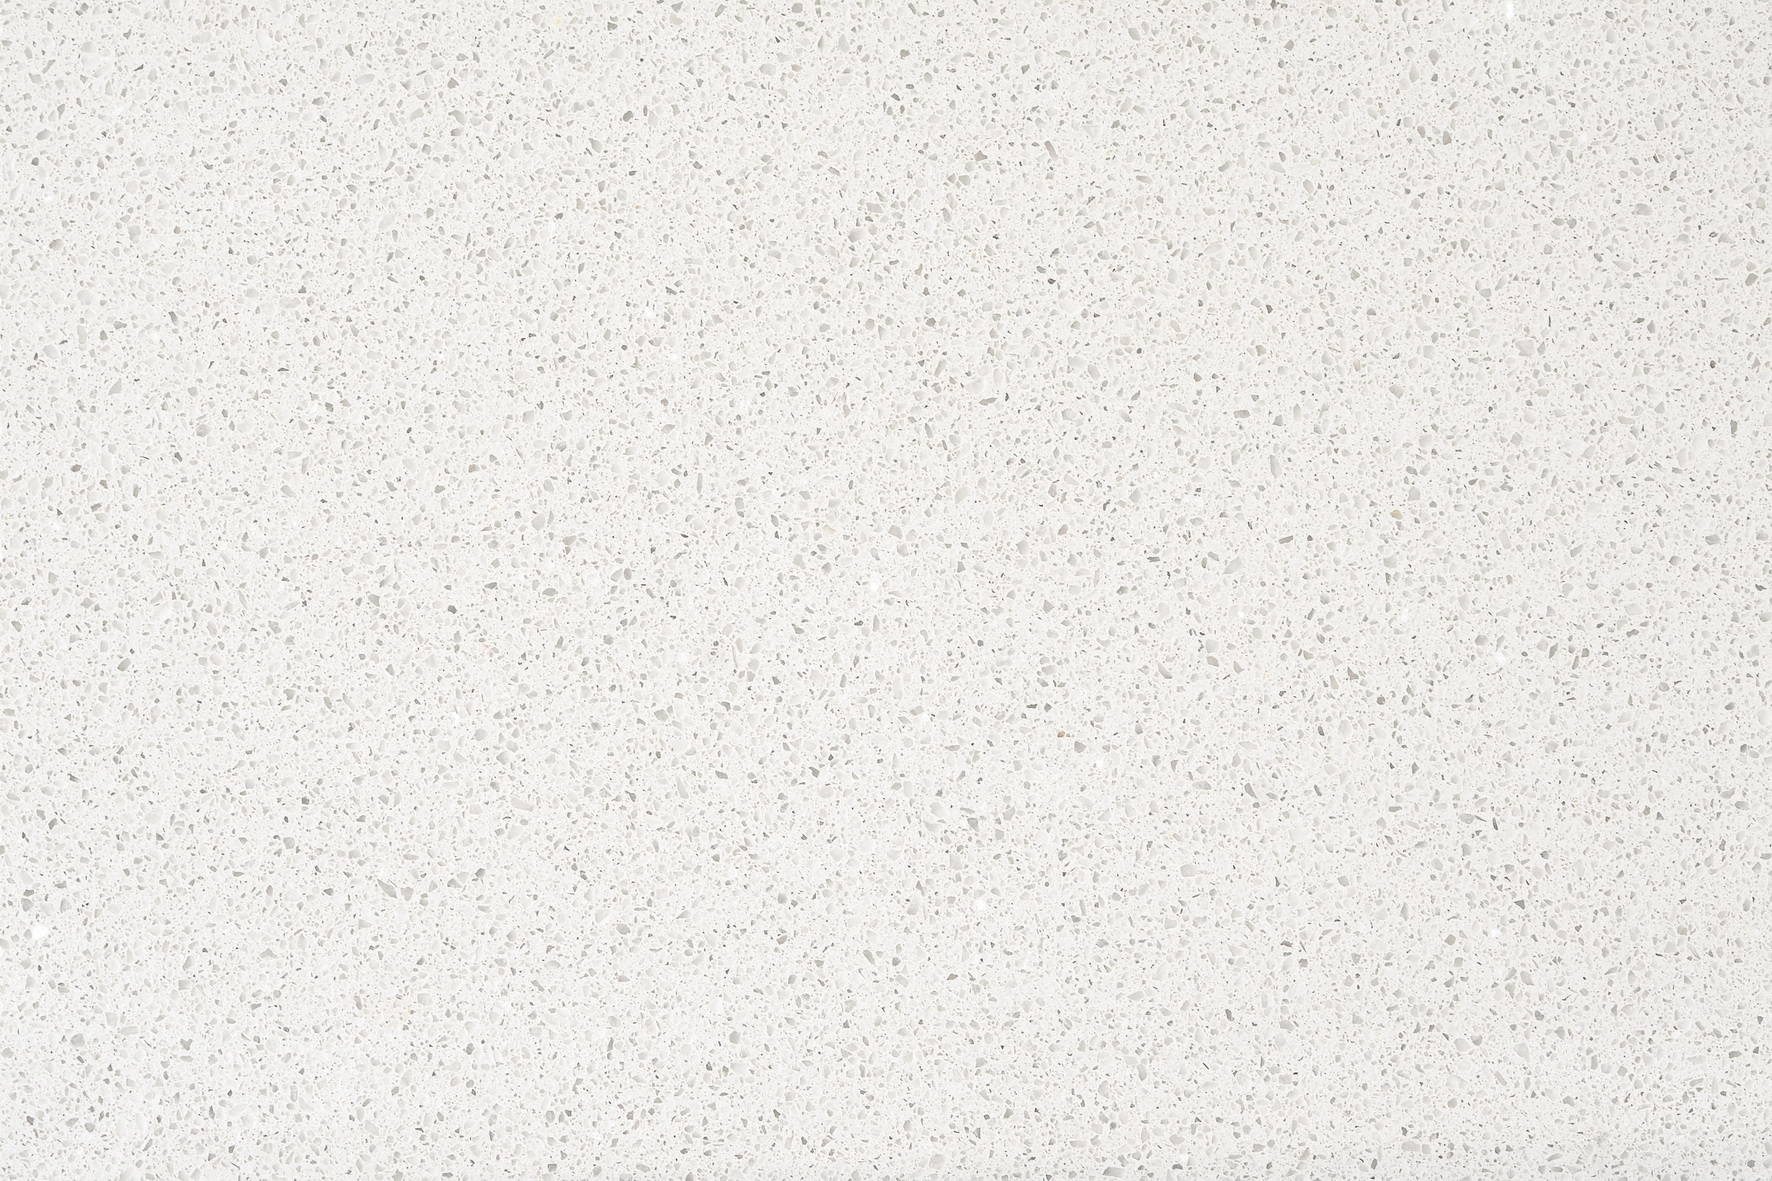 ATHENA WHITE UNIPLUS UNIPLUS LUCIDE Foto: 1_44972_37625.jpg